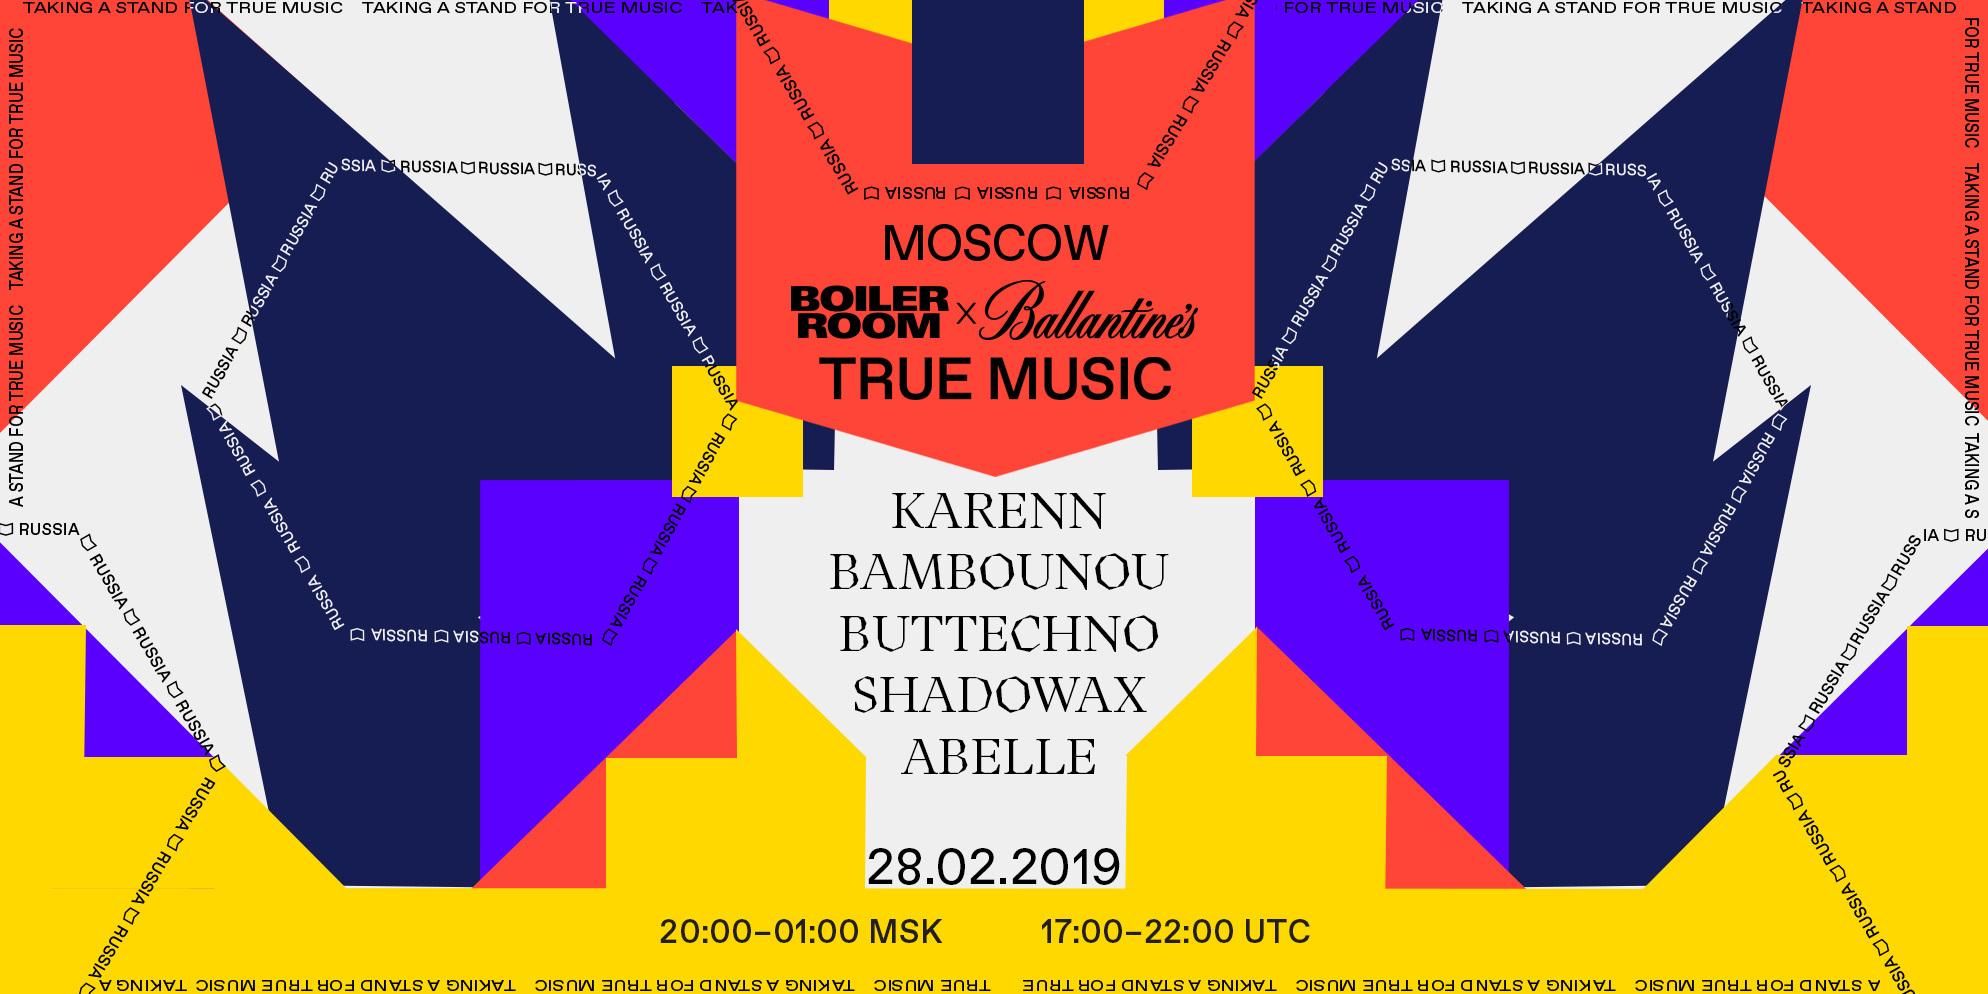 Ballantine's True Music Moscow